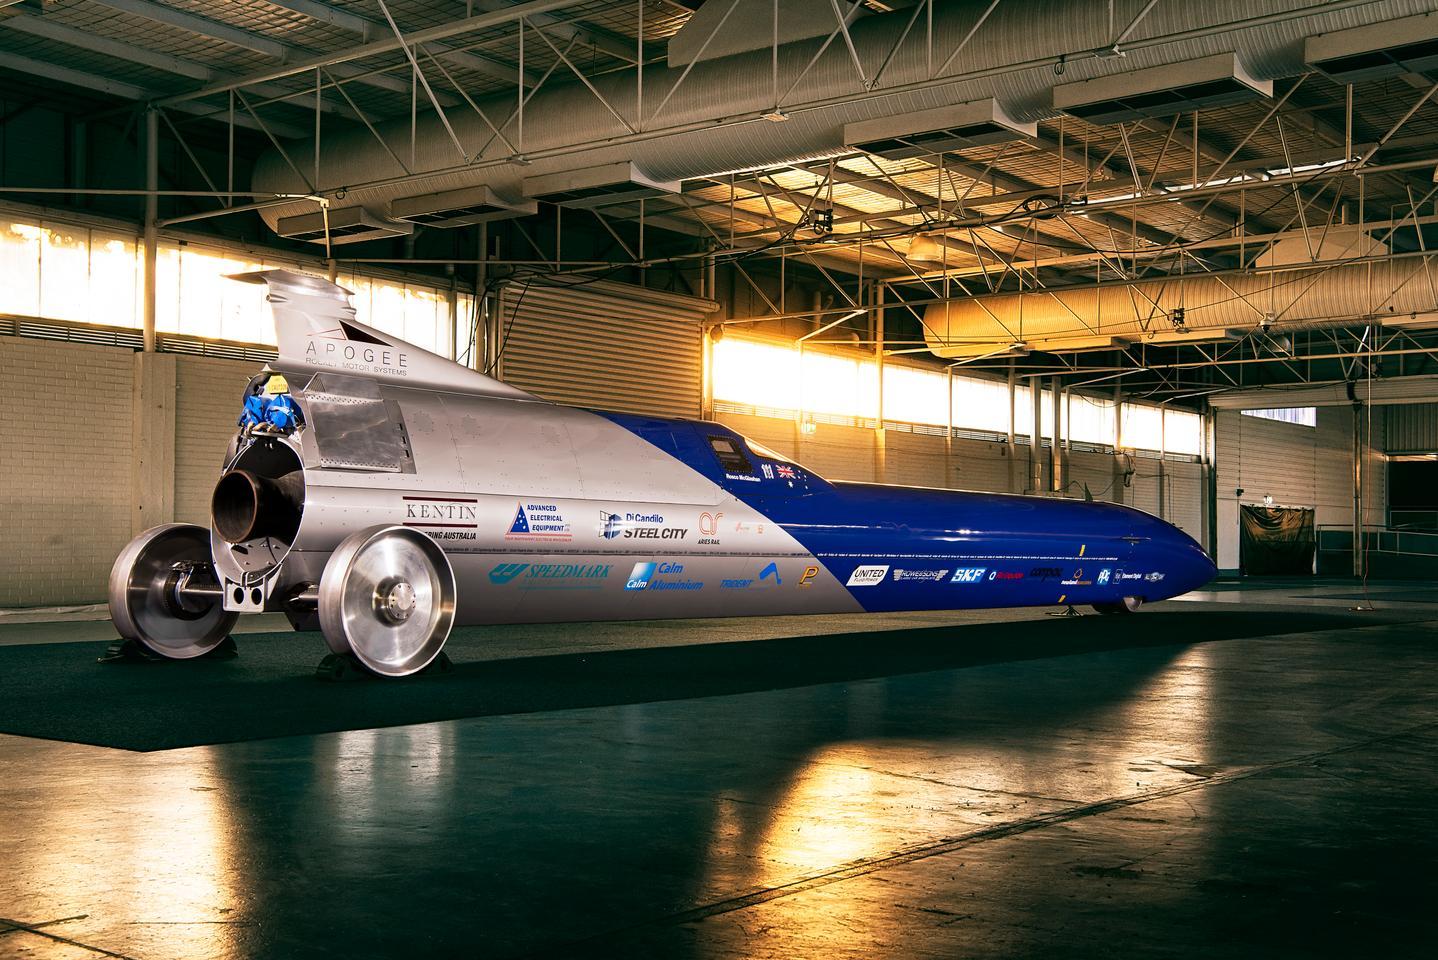 The Aussie Invader 5R's custom-designed rocket engine is good for around 62,000 lbf of thrust